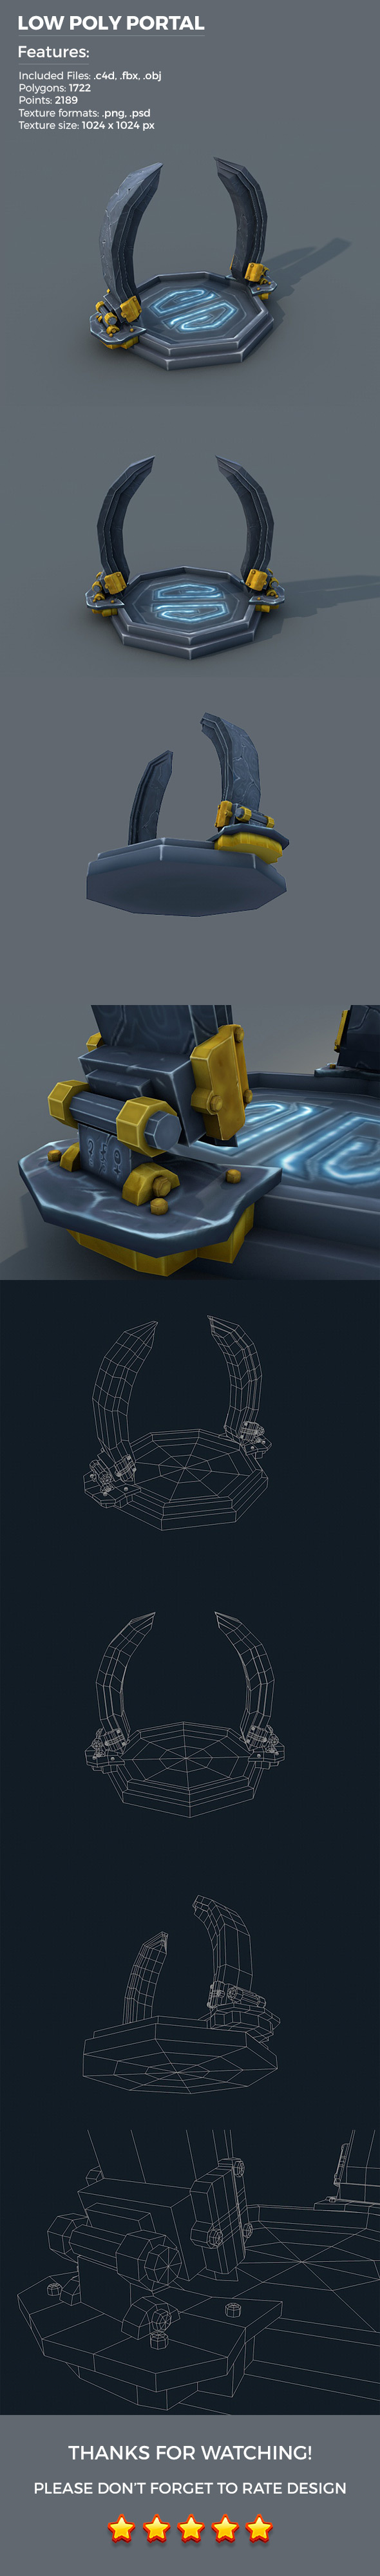 Low Poly Portal - 3DOcean Item for Sale